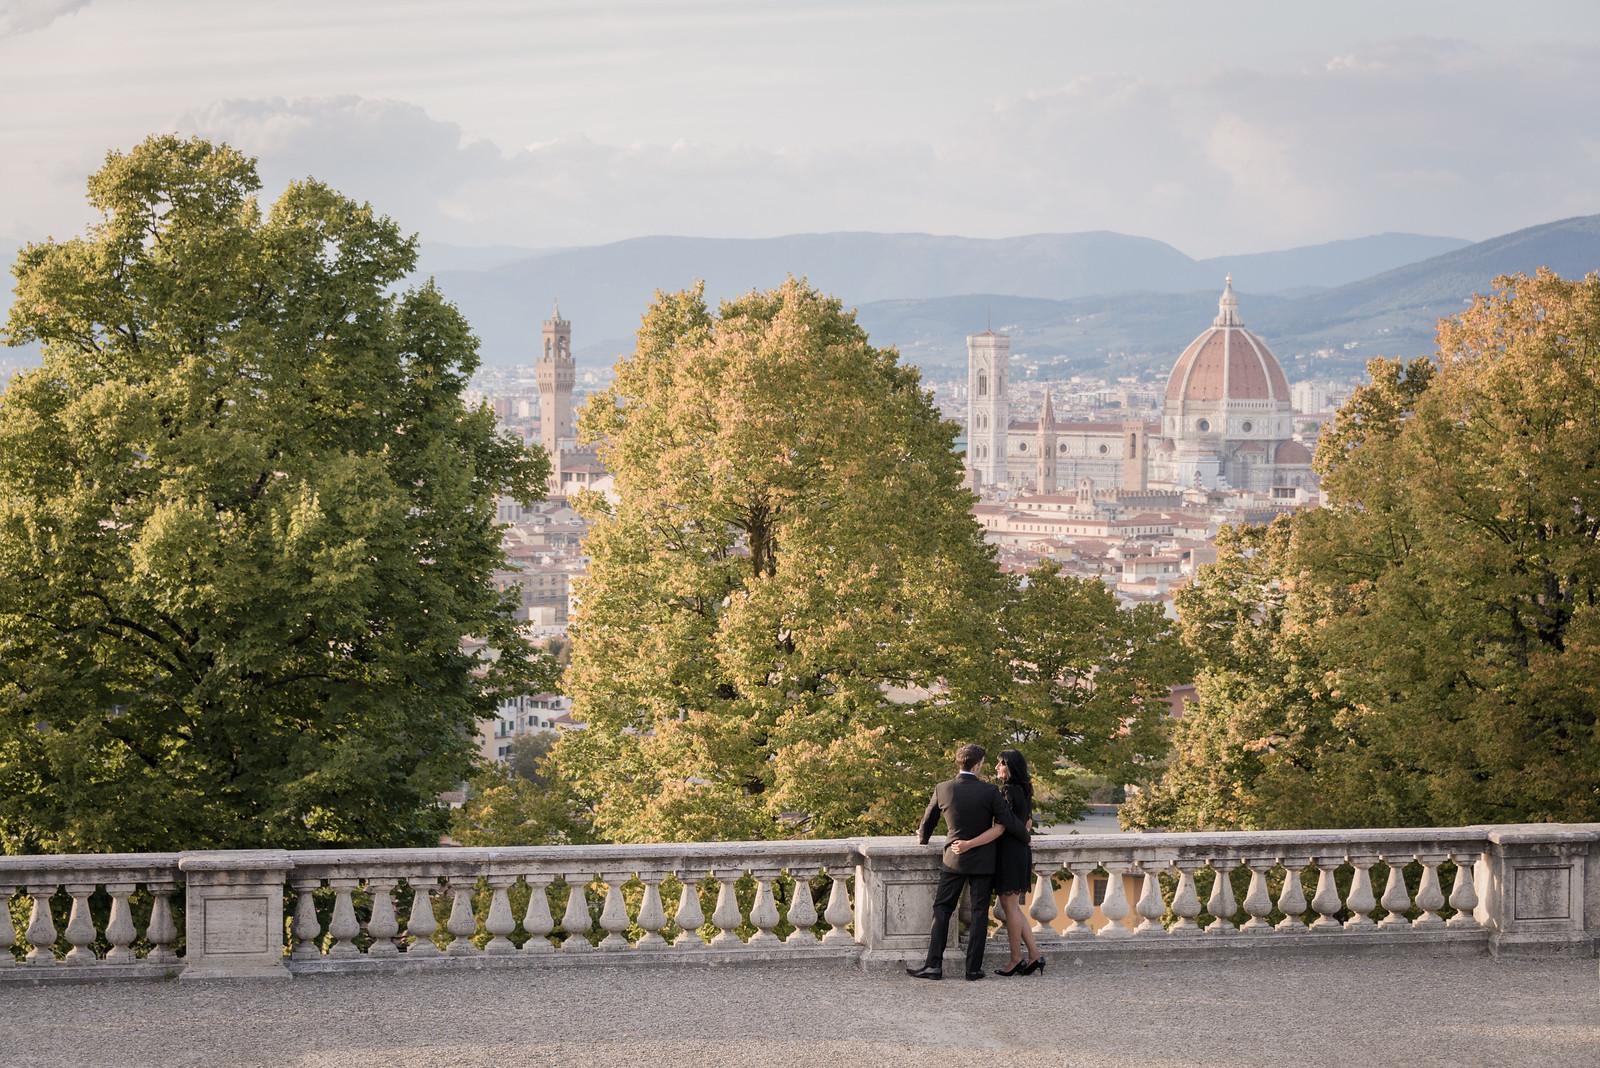 Flytographer Alberto in Florence